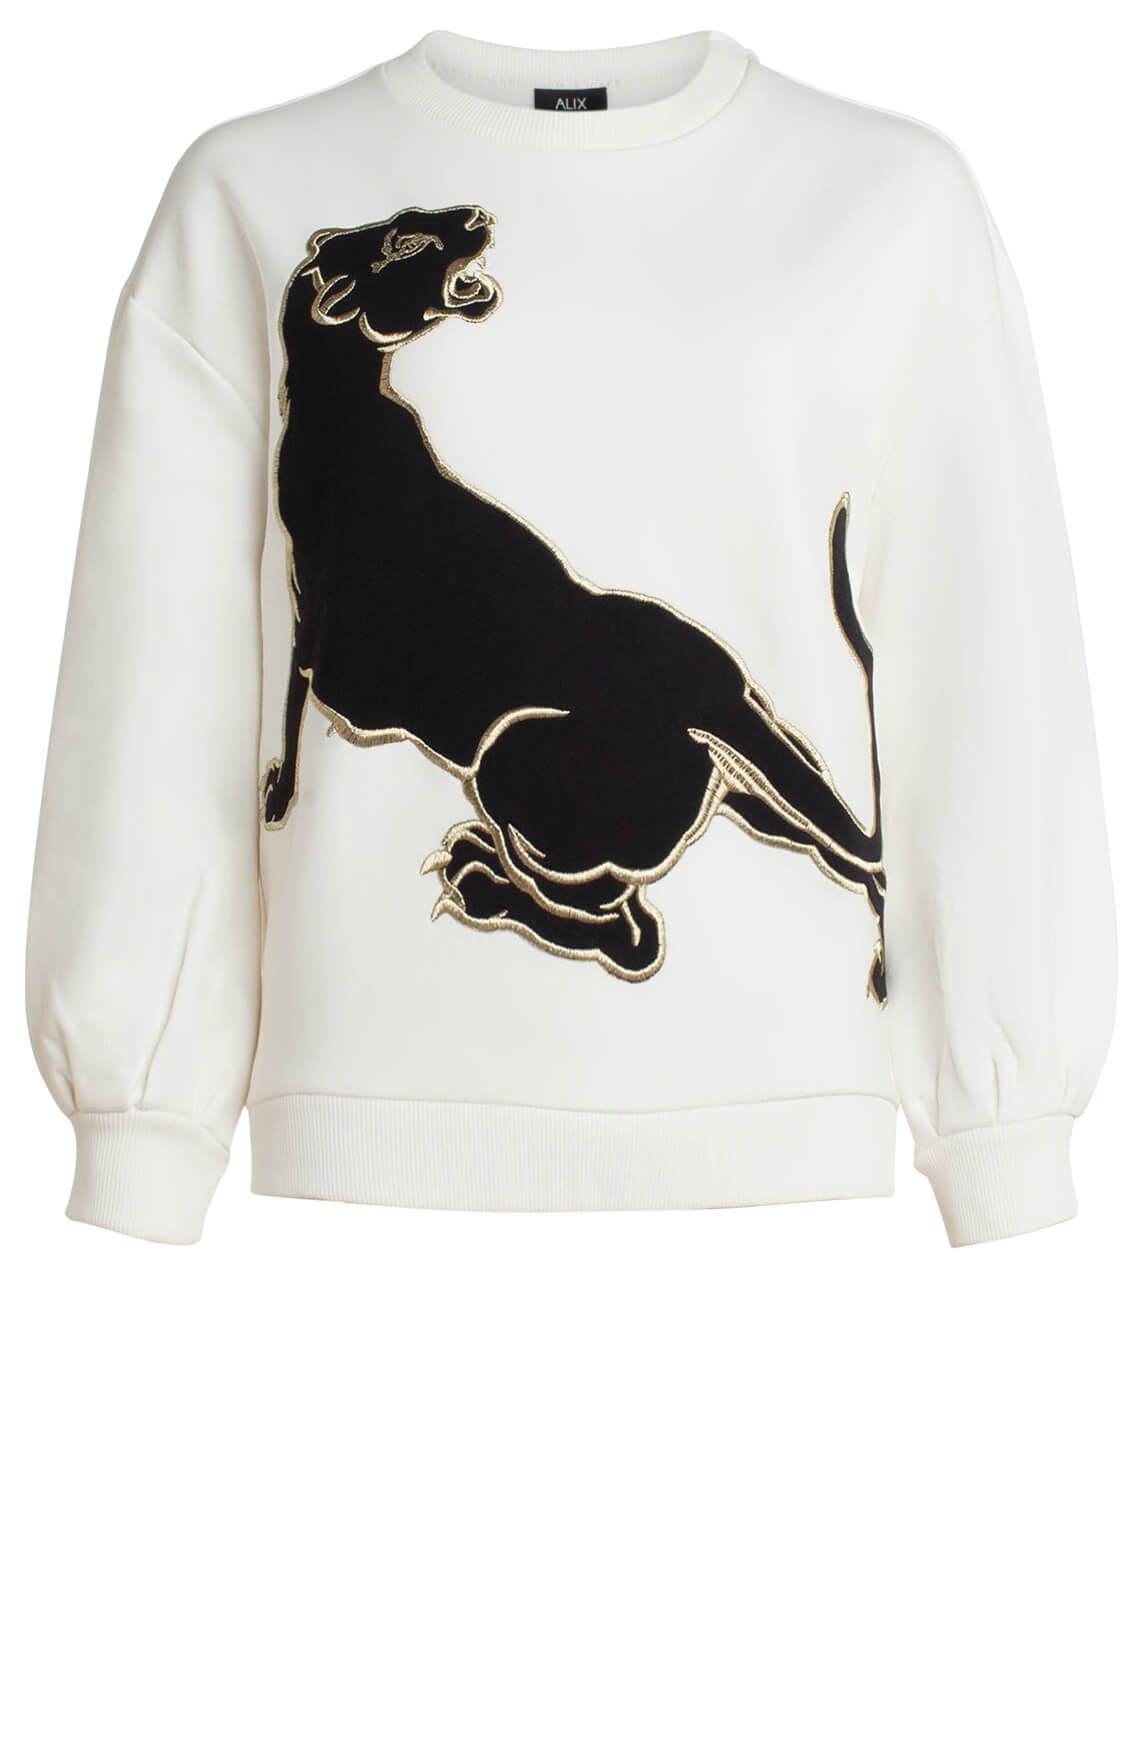 Alix The Label Dames Sweater met animalprint wit